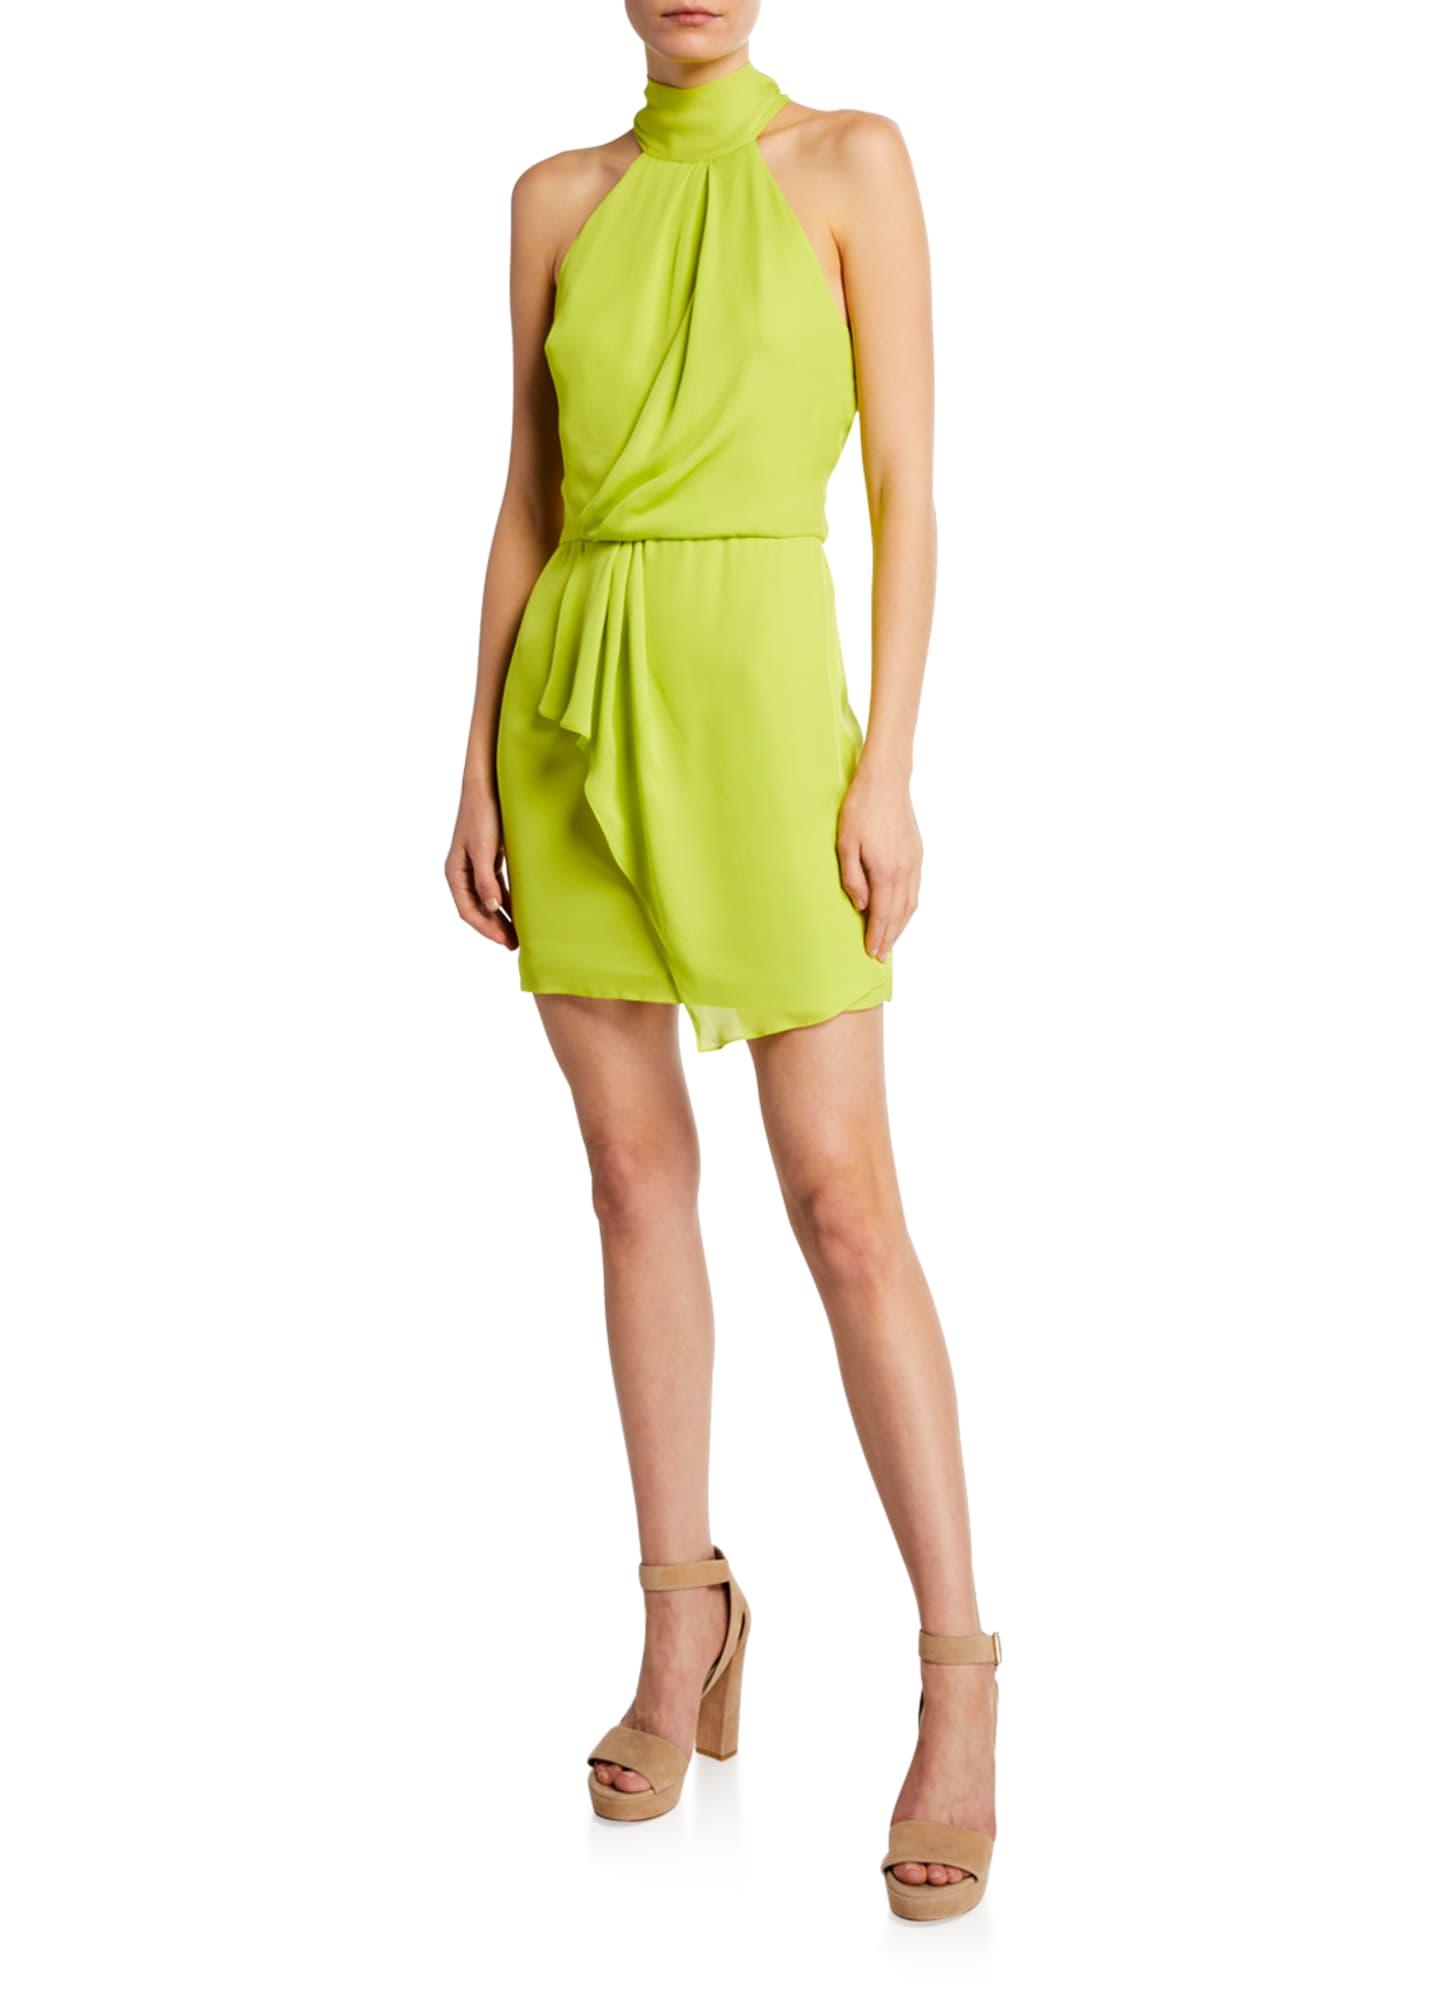 Halston F2 Sleeveless Mock-Neck Dress with Drape Front